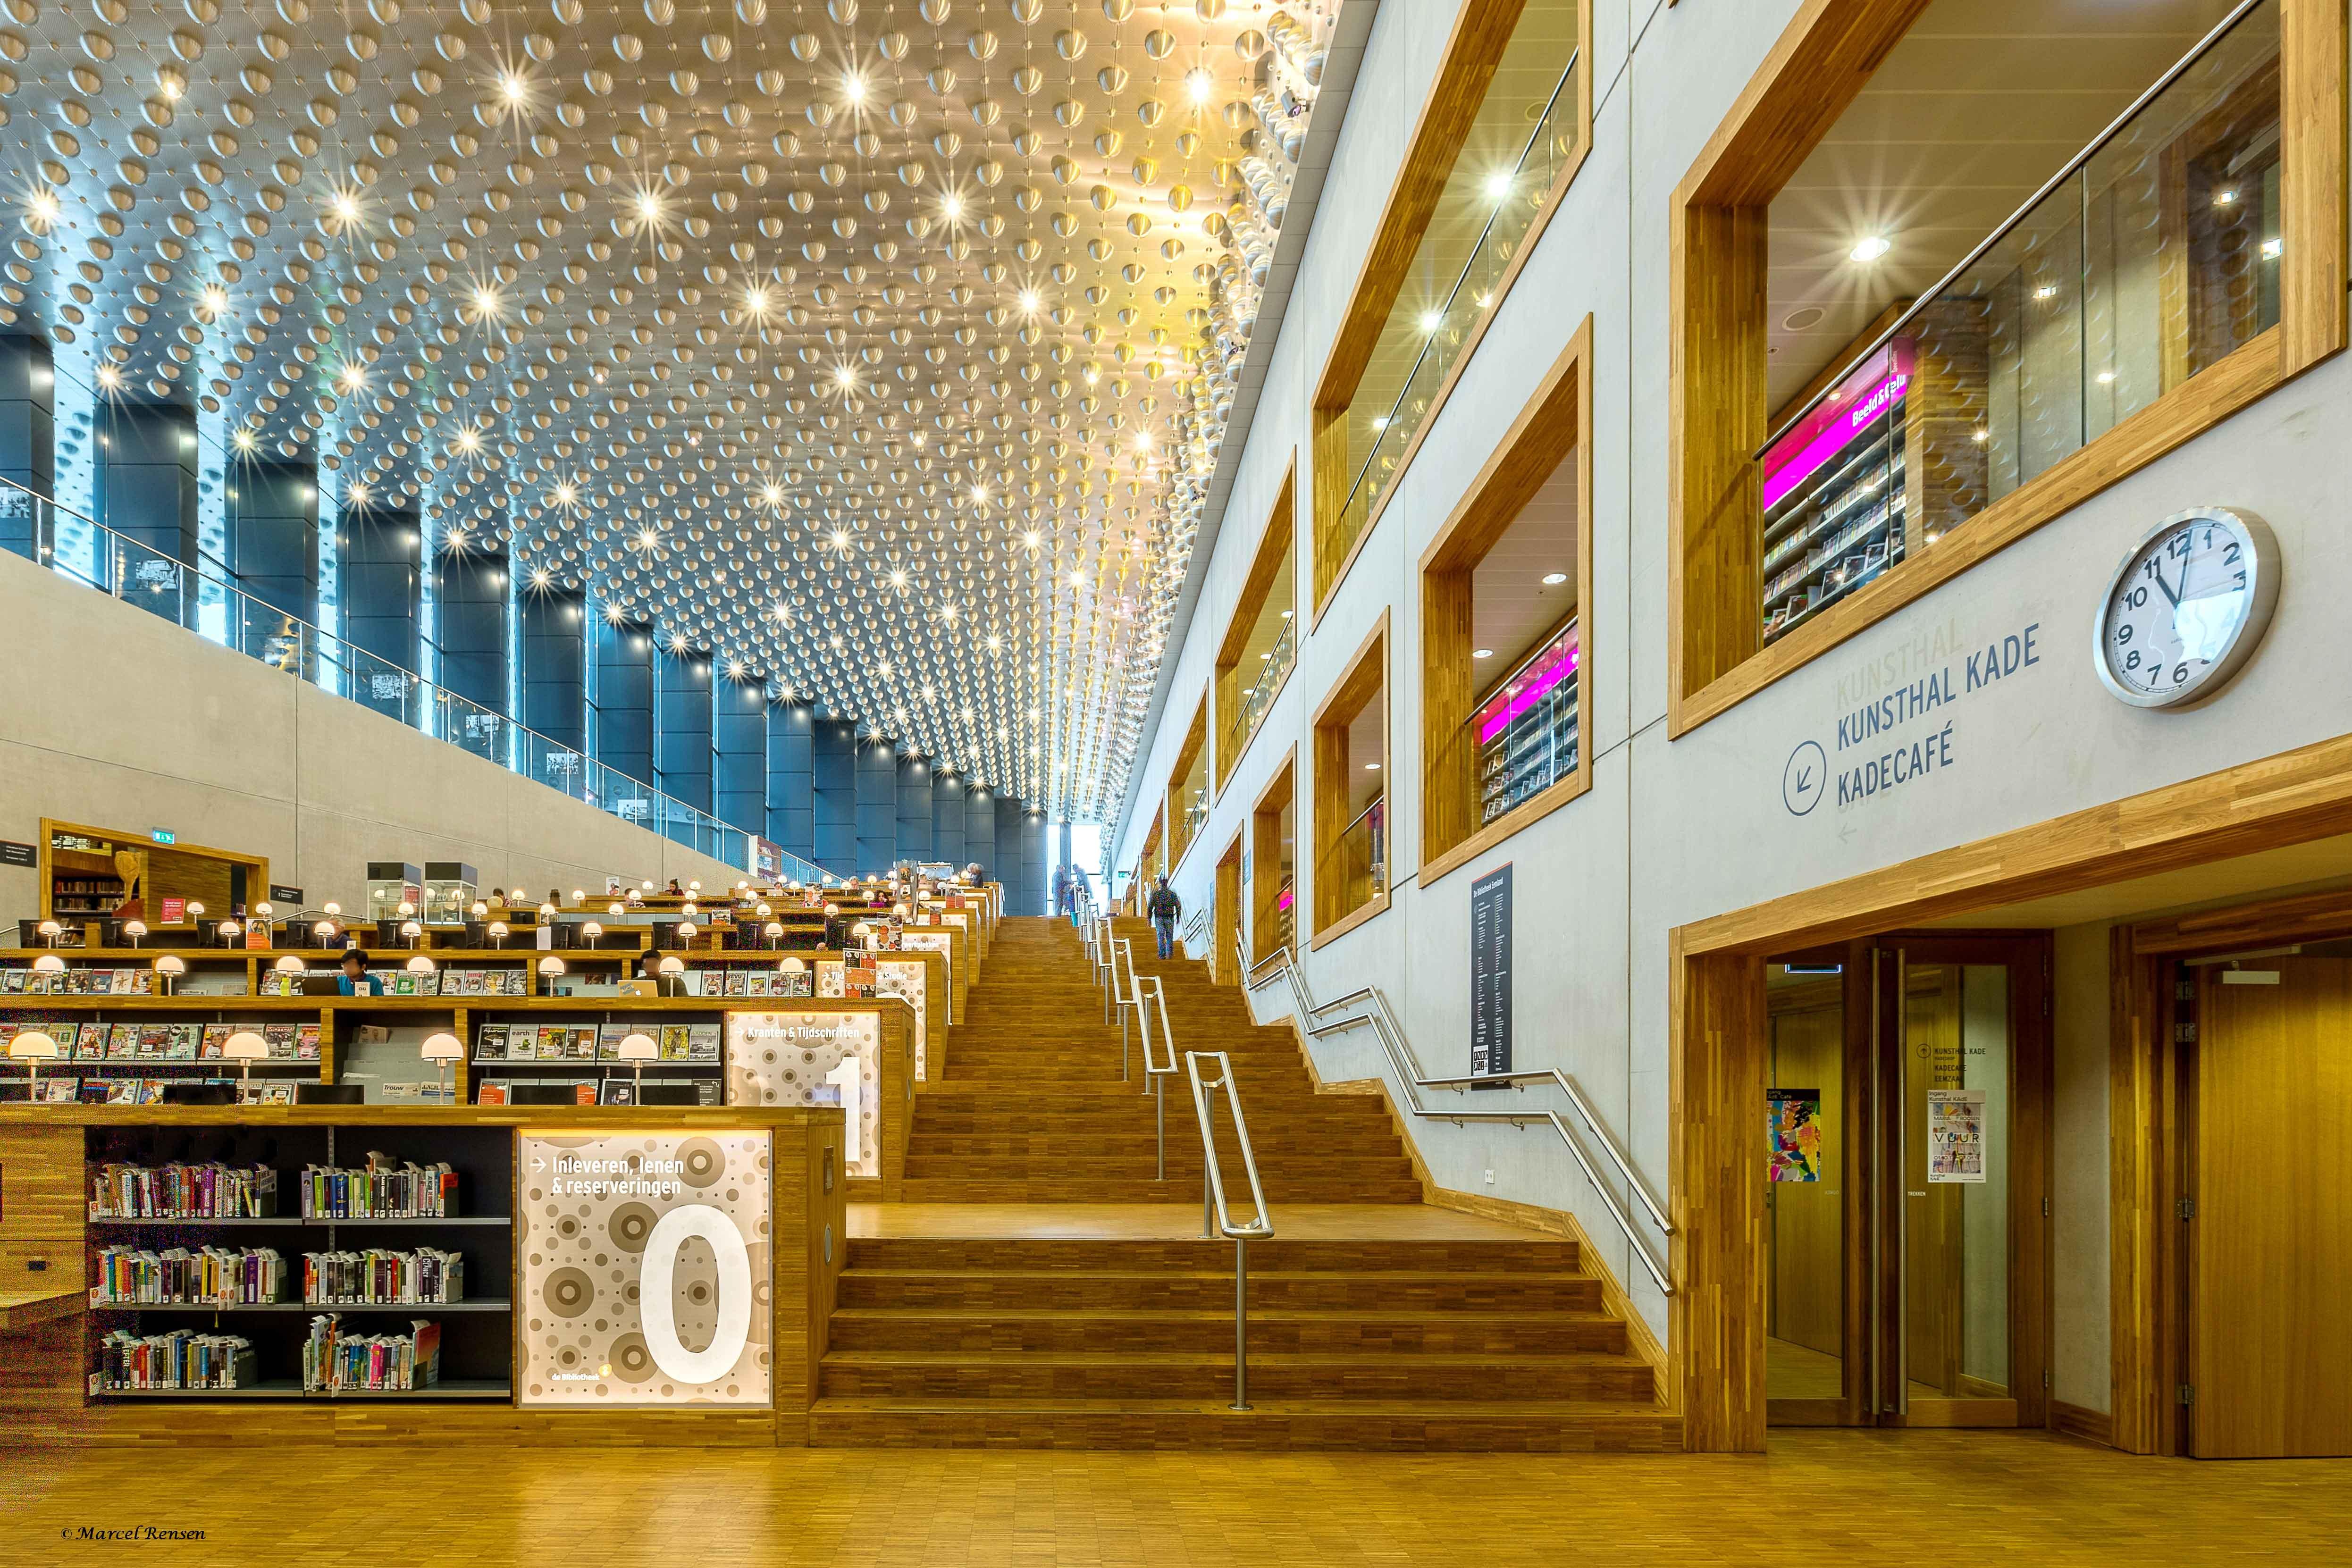 Lijstje-mooiste-bibliothekenNederland-openbare-bieb-Eemland-Amersfoort